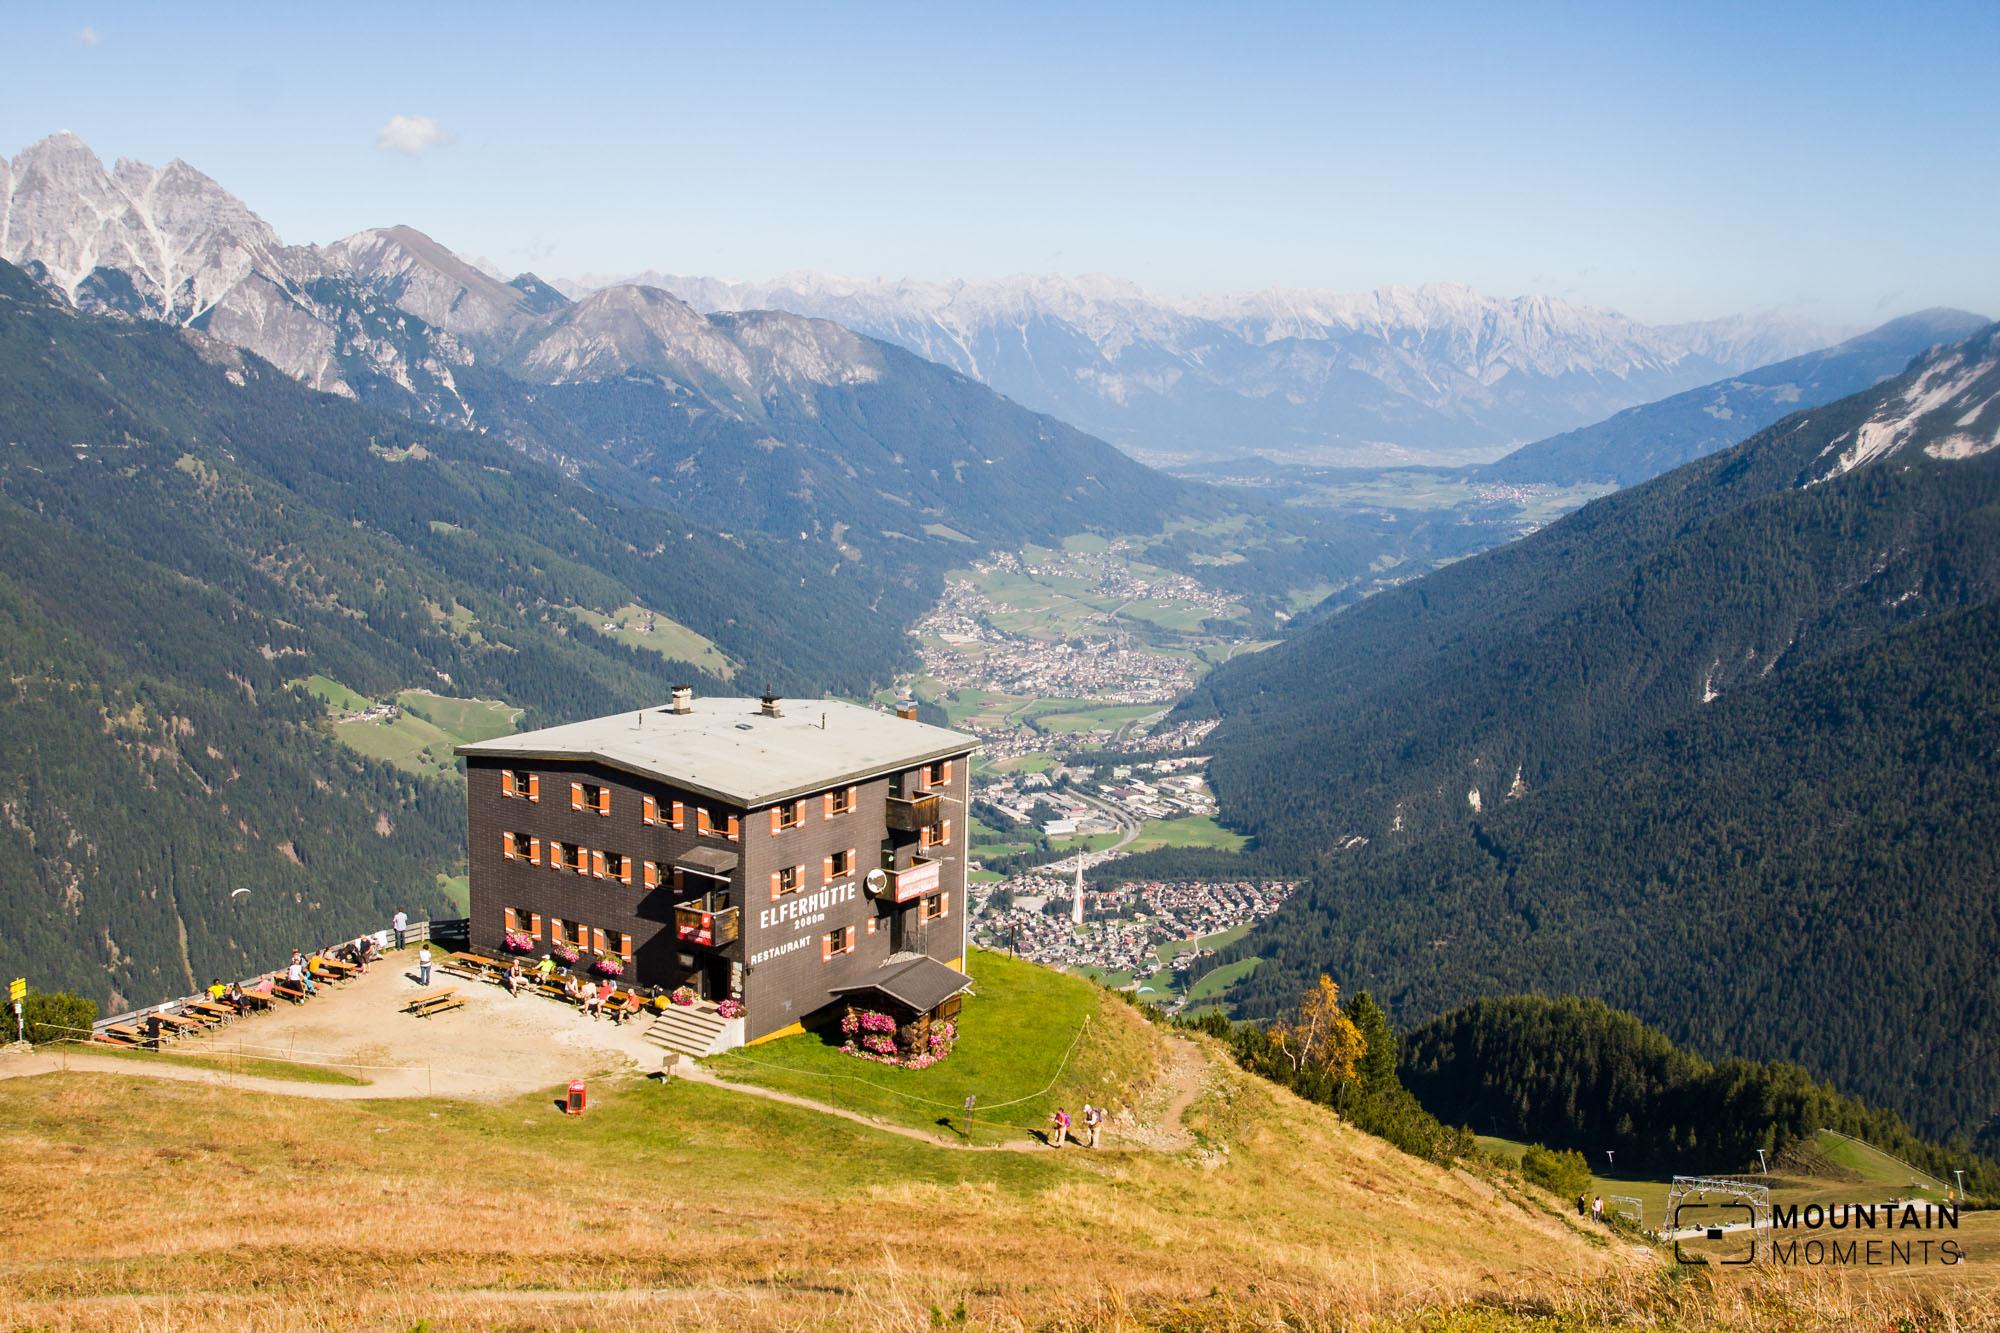 elferhütte, stubaital fotospot, fotografieren stubaital, schöne wanderung stubaital